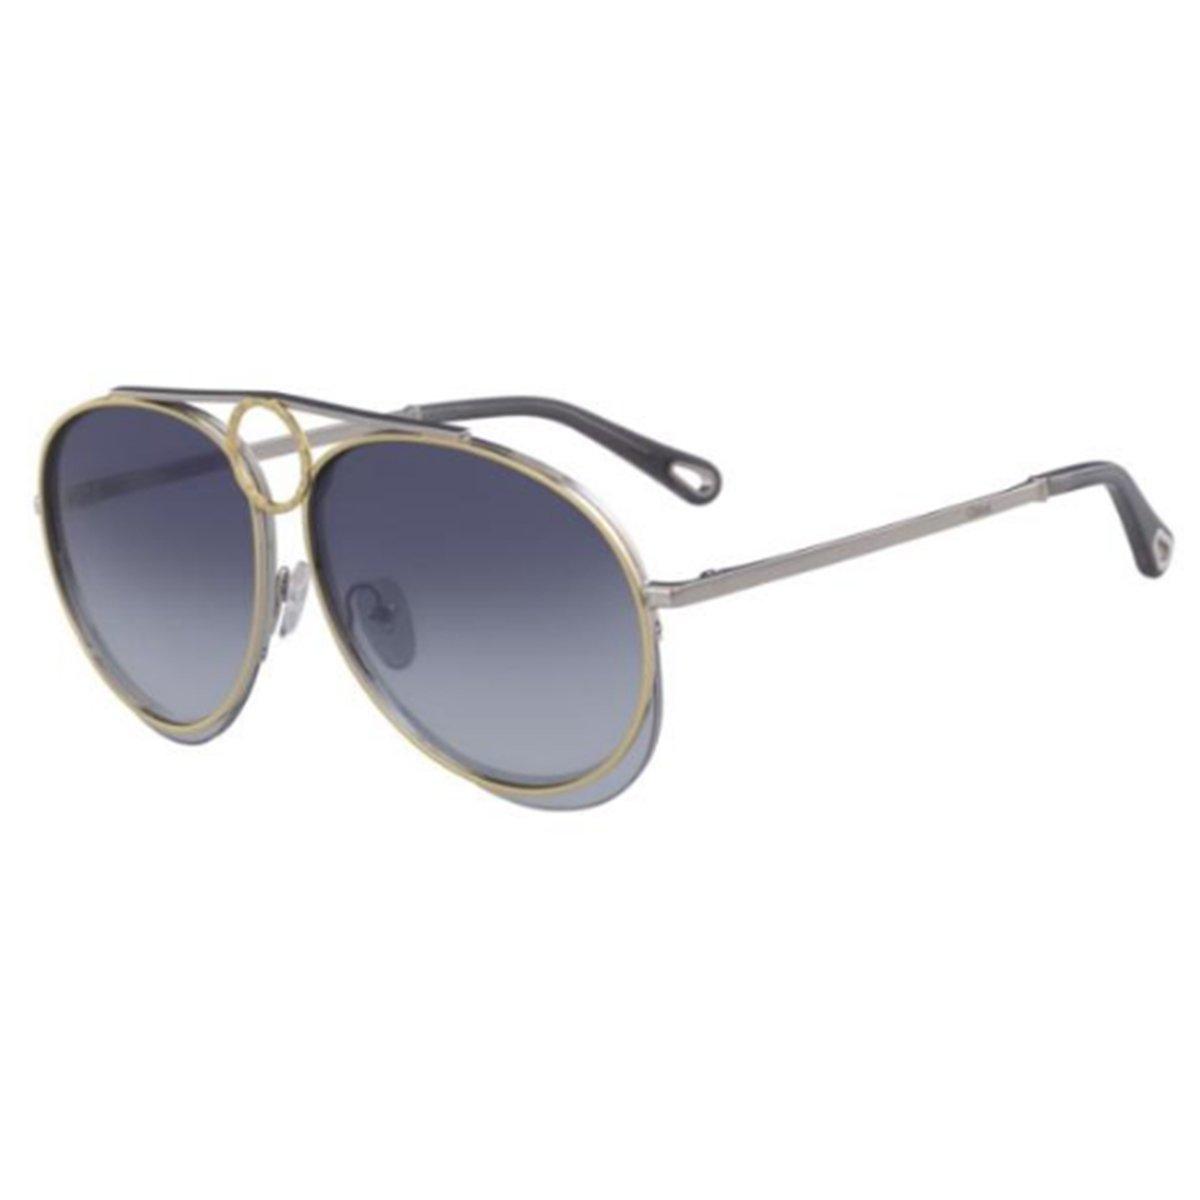 5393742dea143 Compre Óculos de Sol Chloé em 10X   Tri-Jóia Shop